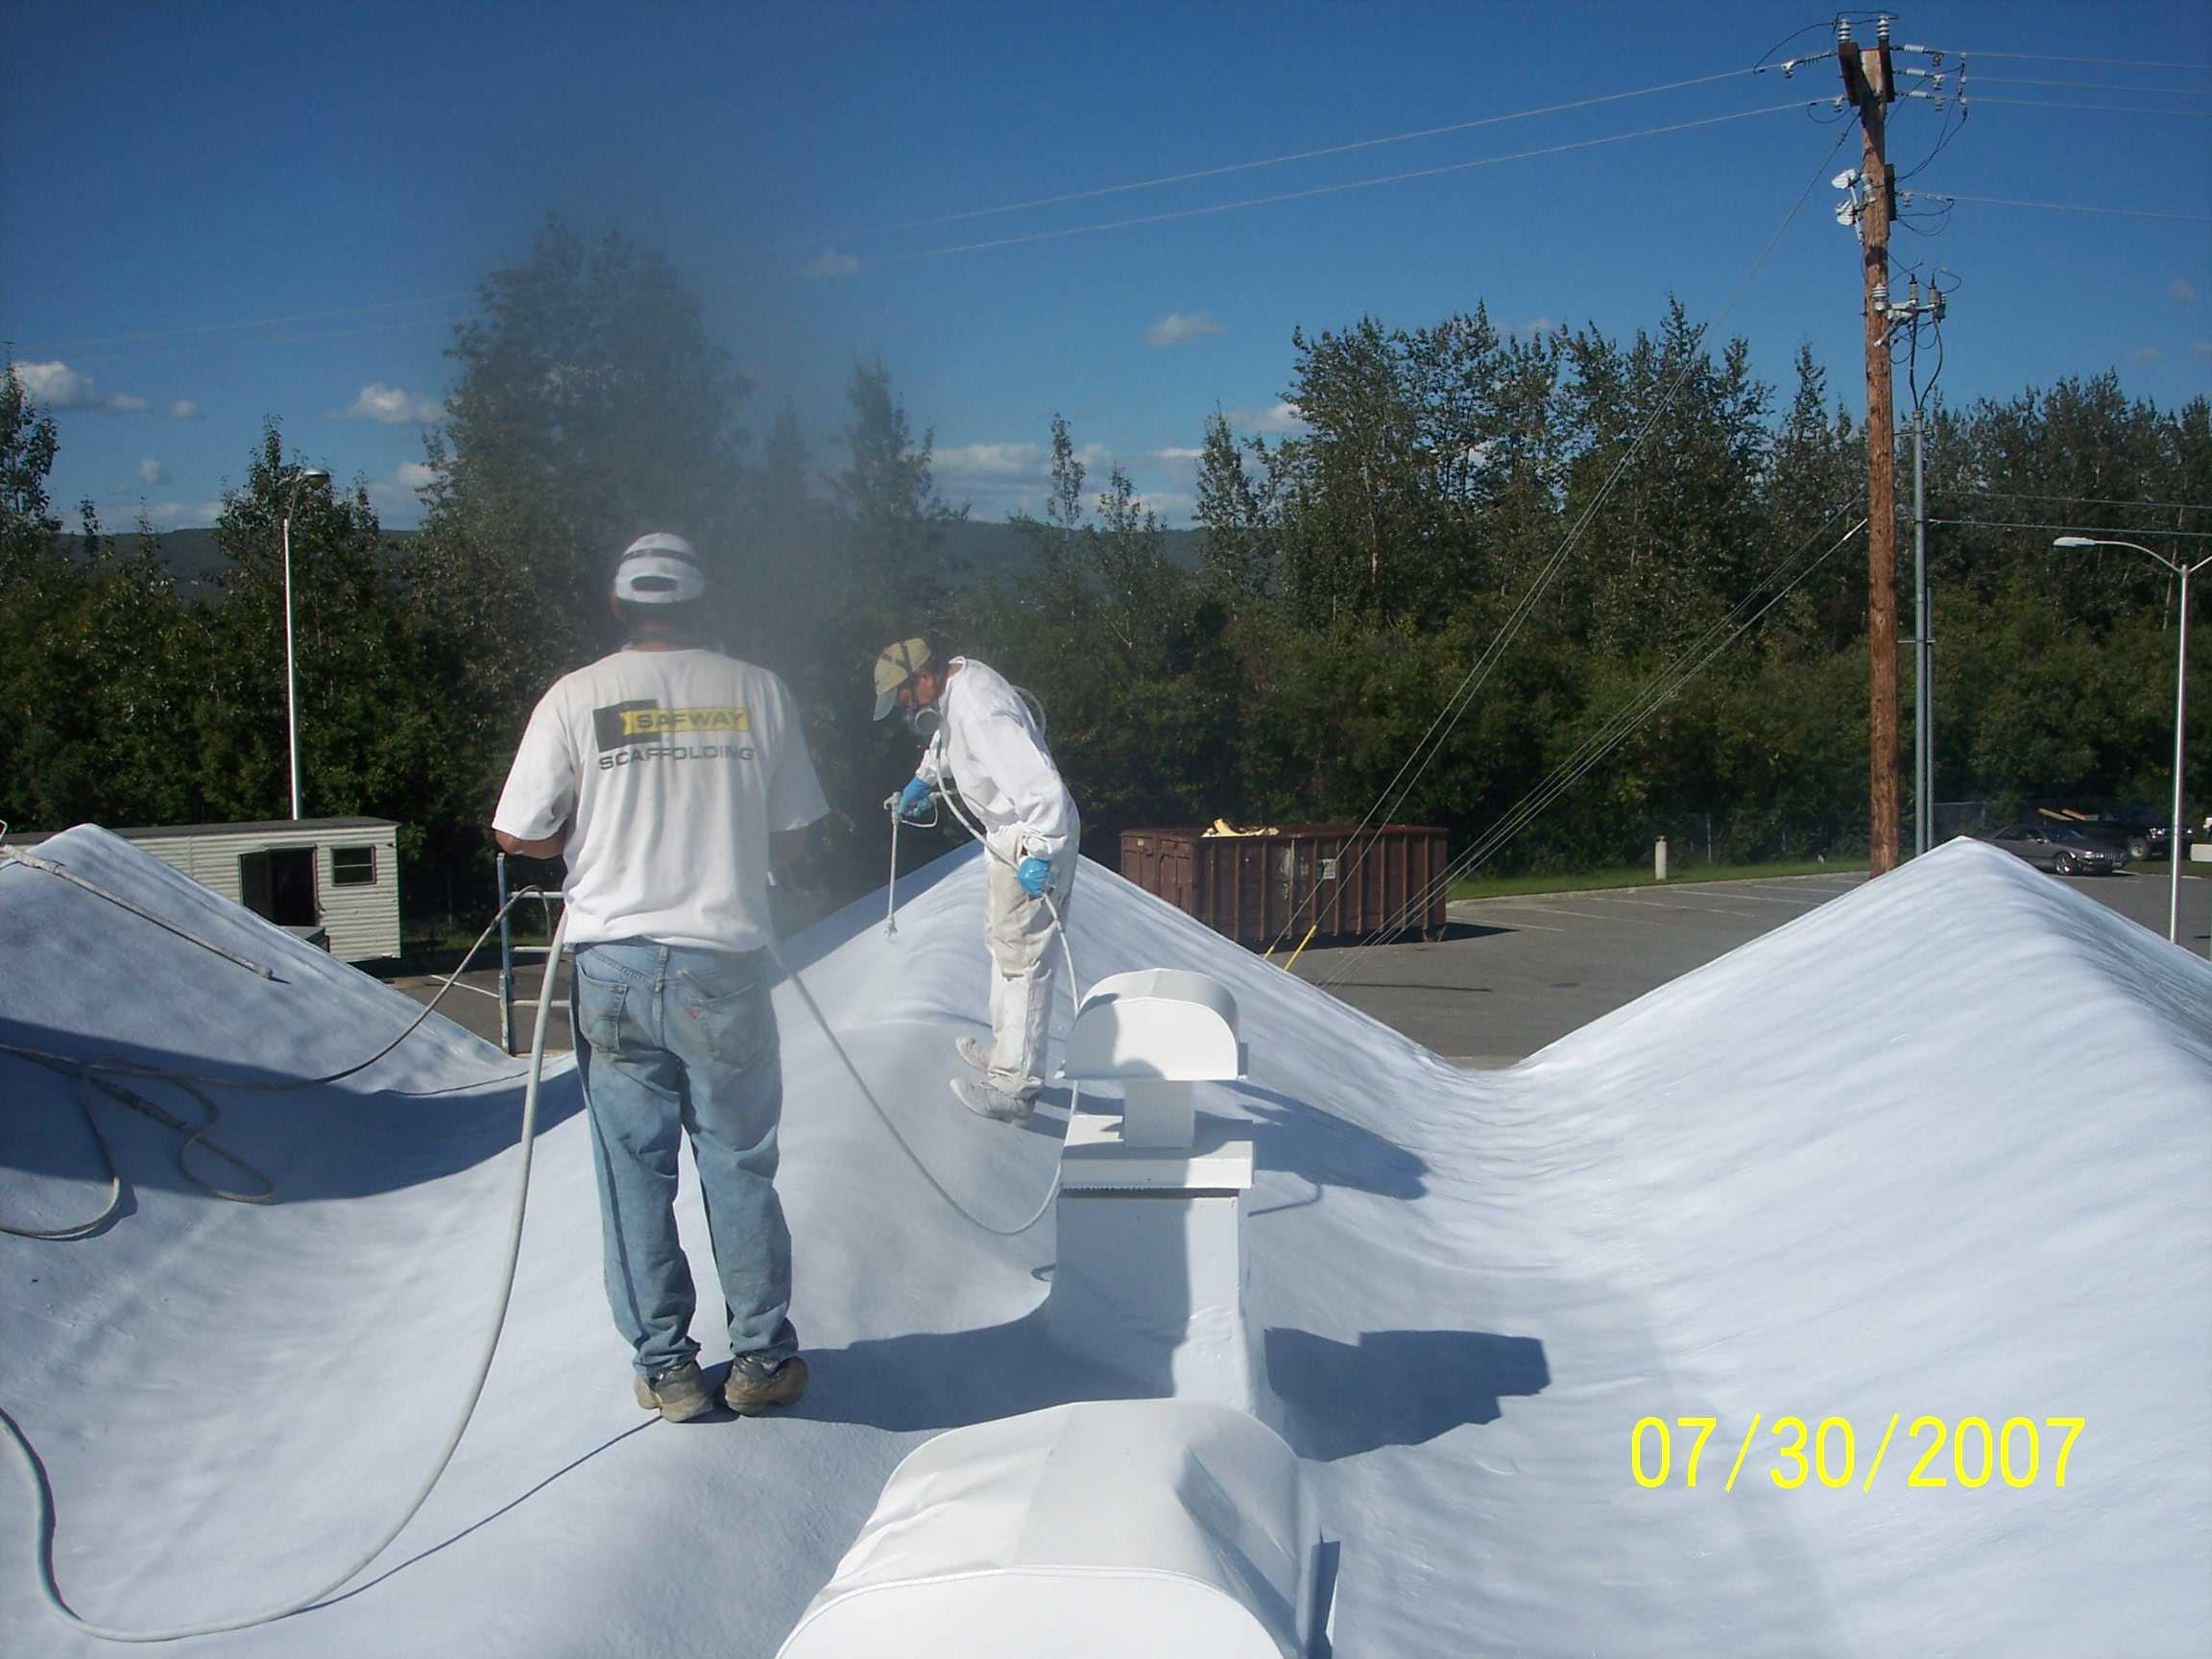 Vertex Insulation Serving Fairbanks Since 78